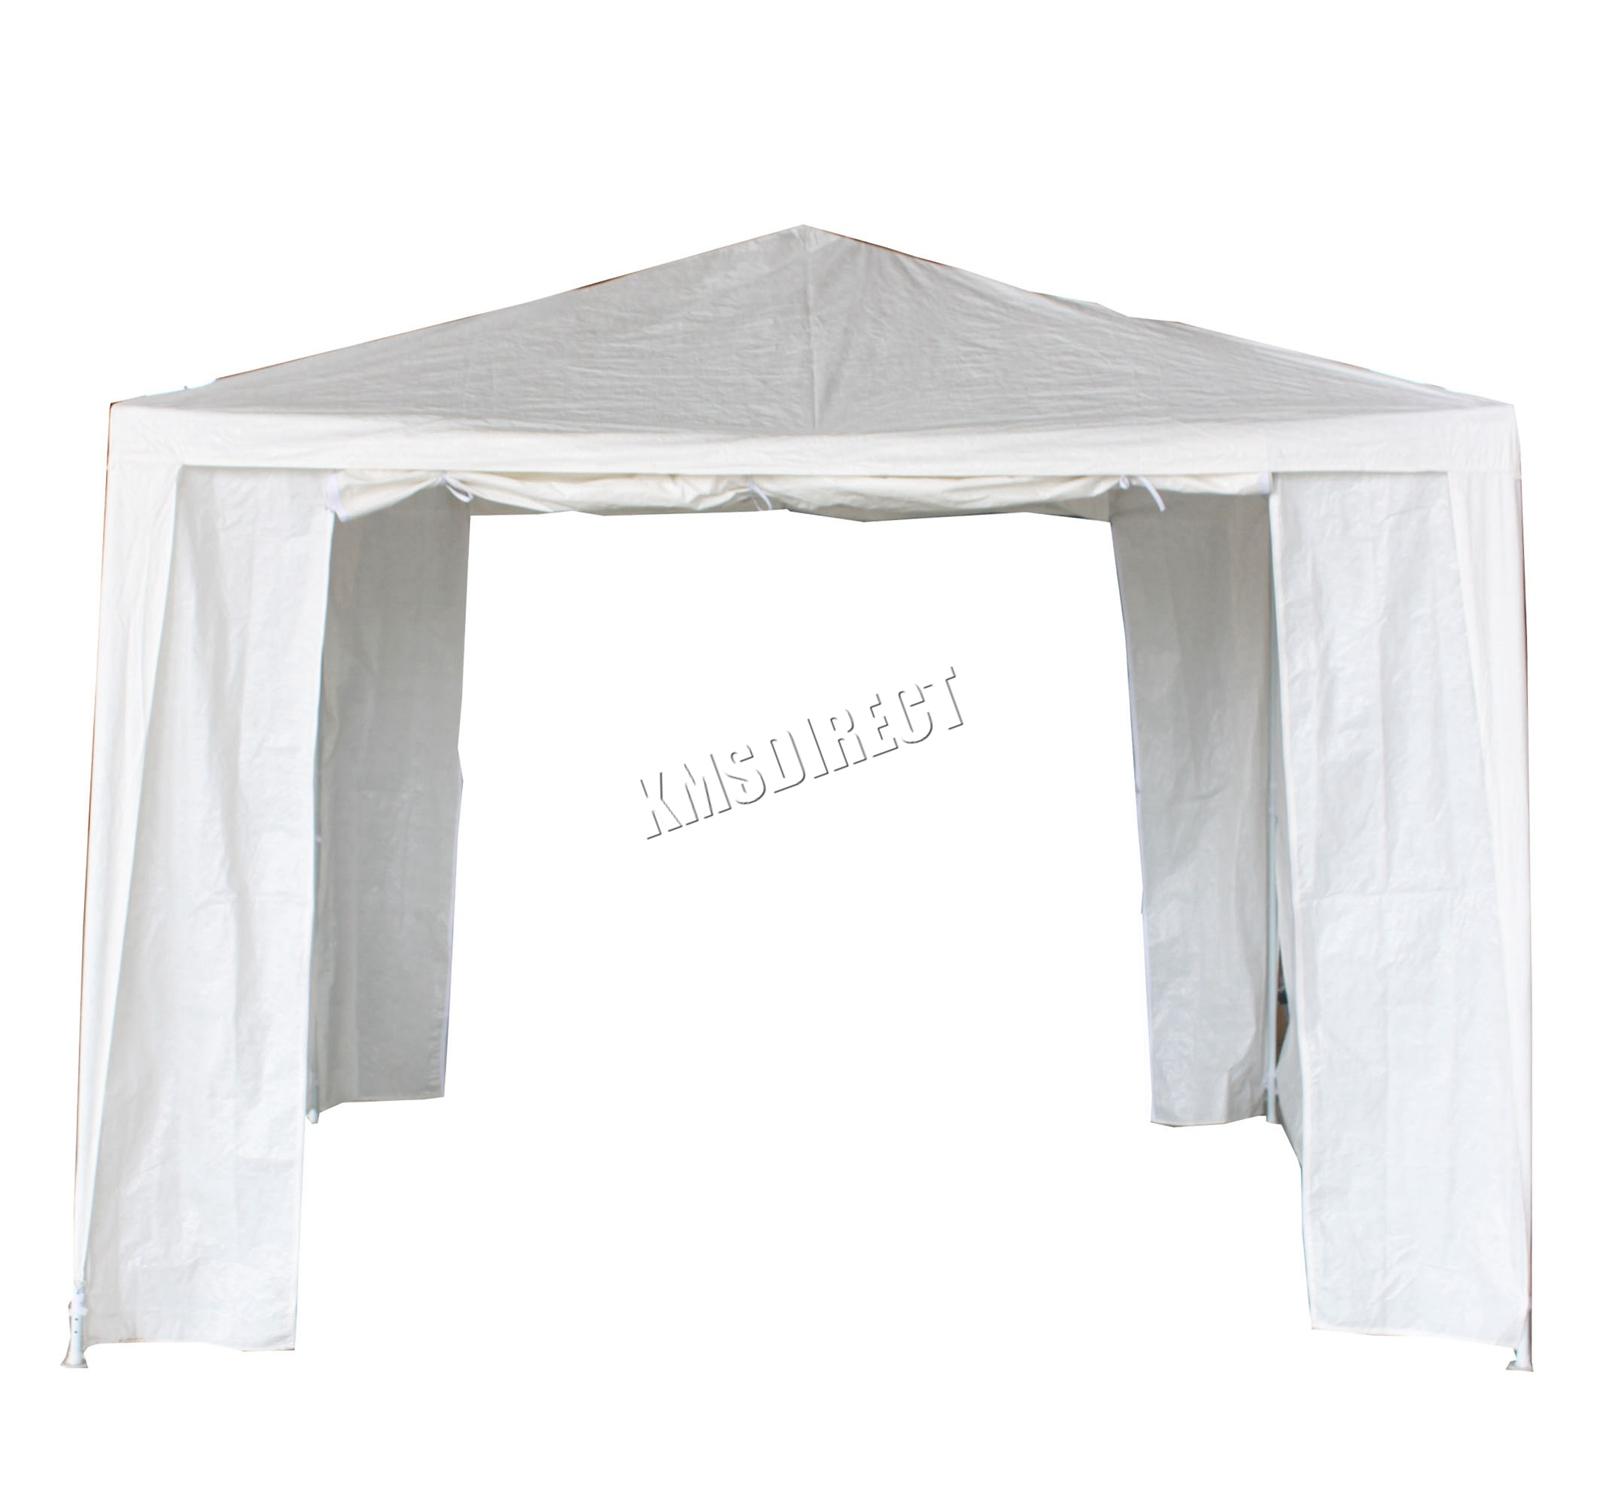 New-3-x-3m-120g-Waterproof-Outdoor-PE-Garden-Gazebo-Marquee-Canopy-Party-Tent Indexbild 32